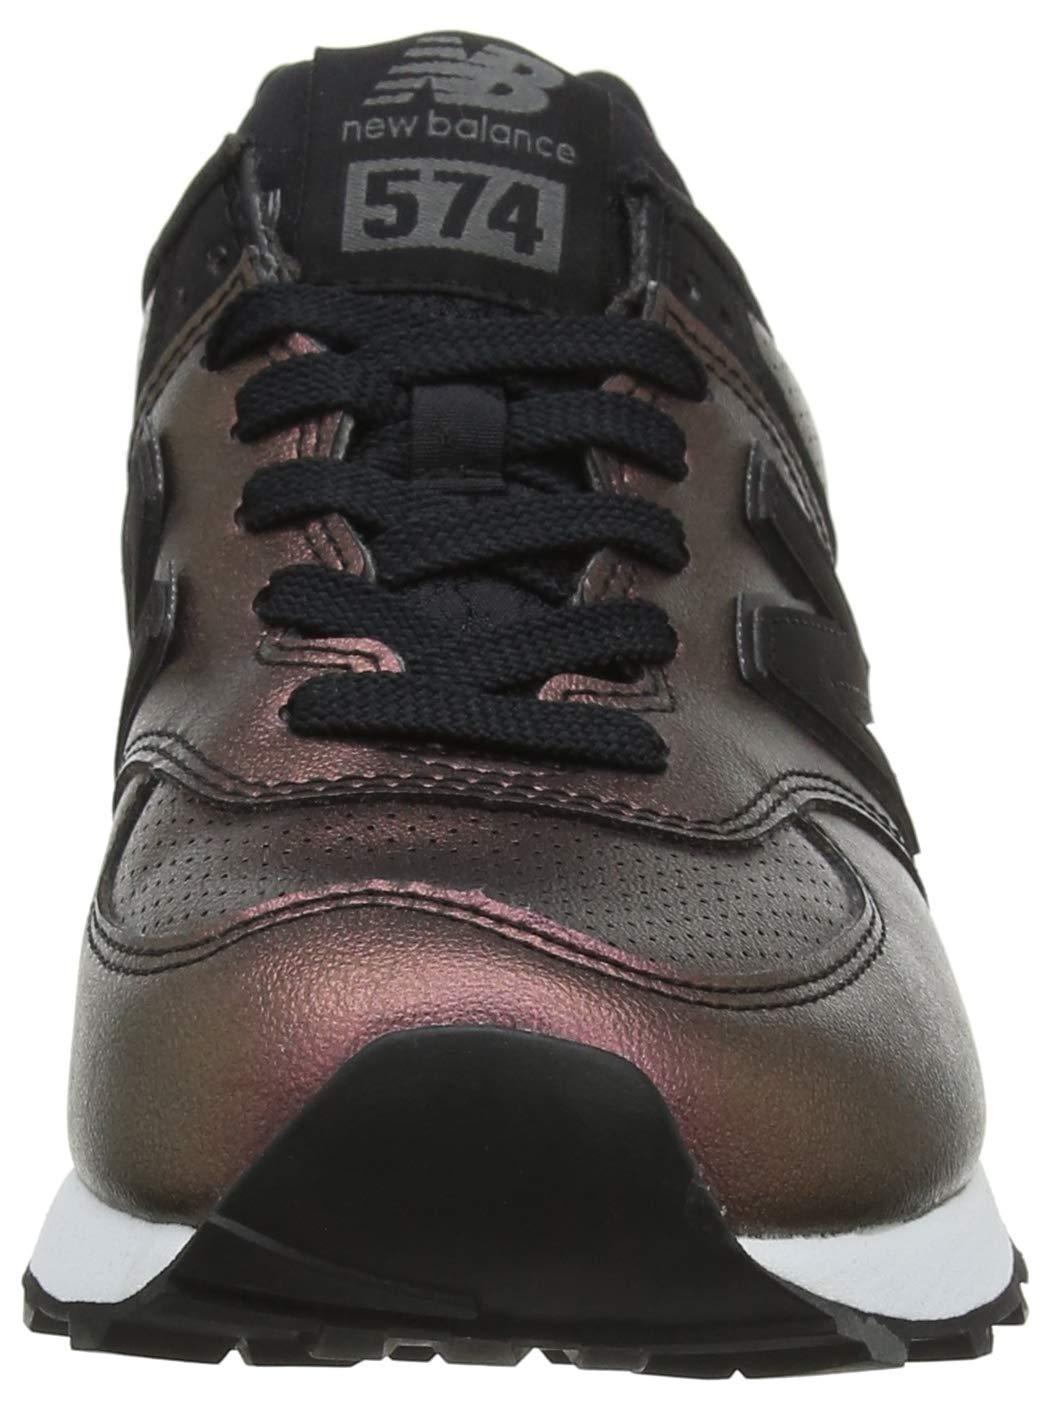 New Balance Damen 574v2 (schwarz/schwarz Sneaker, Schwarz (schwarz/schwarz 574v2 Ksb) 4dbd0c